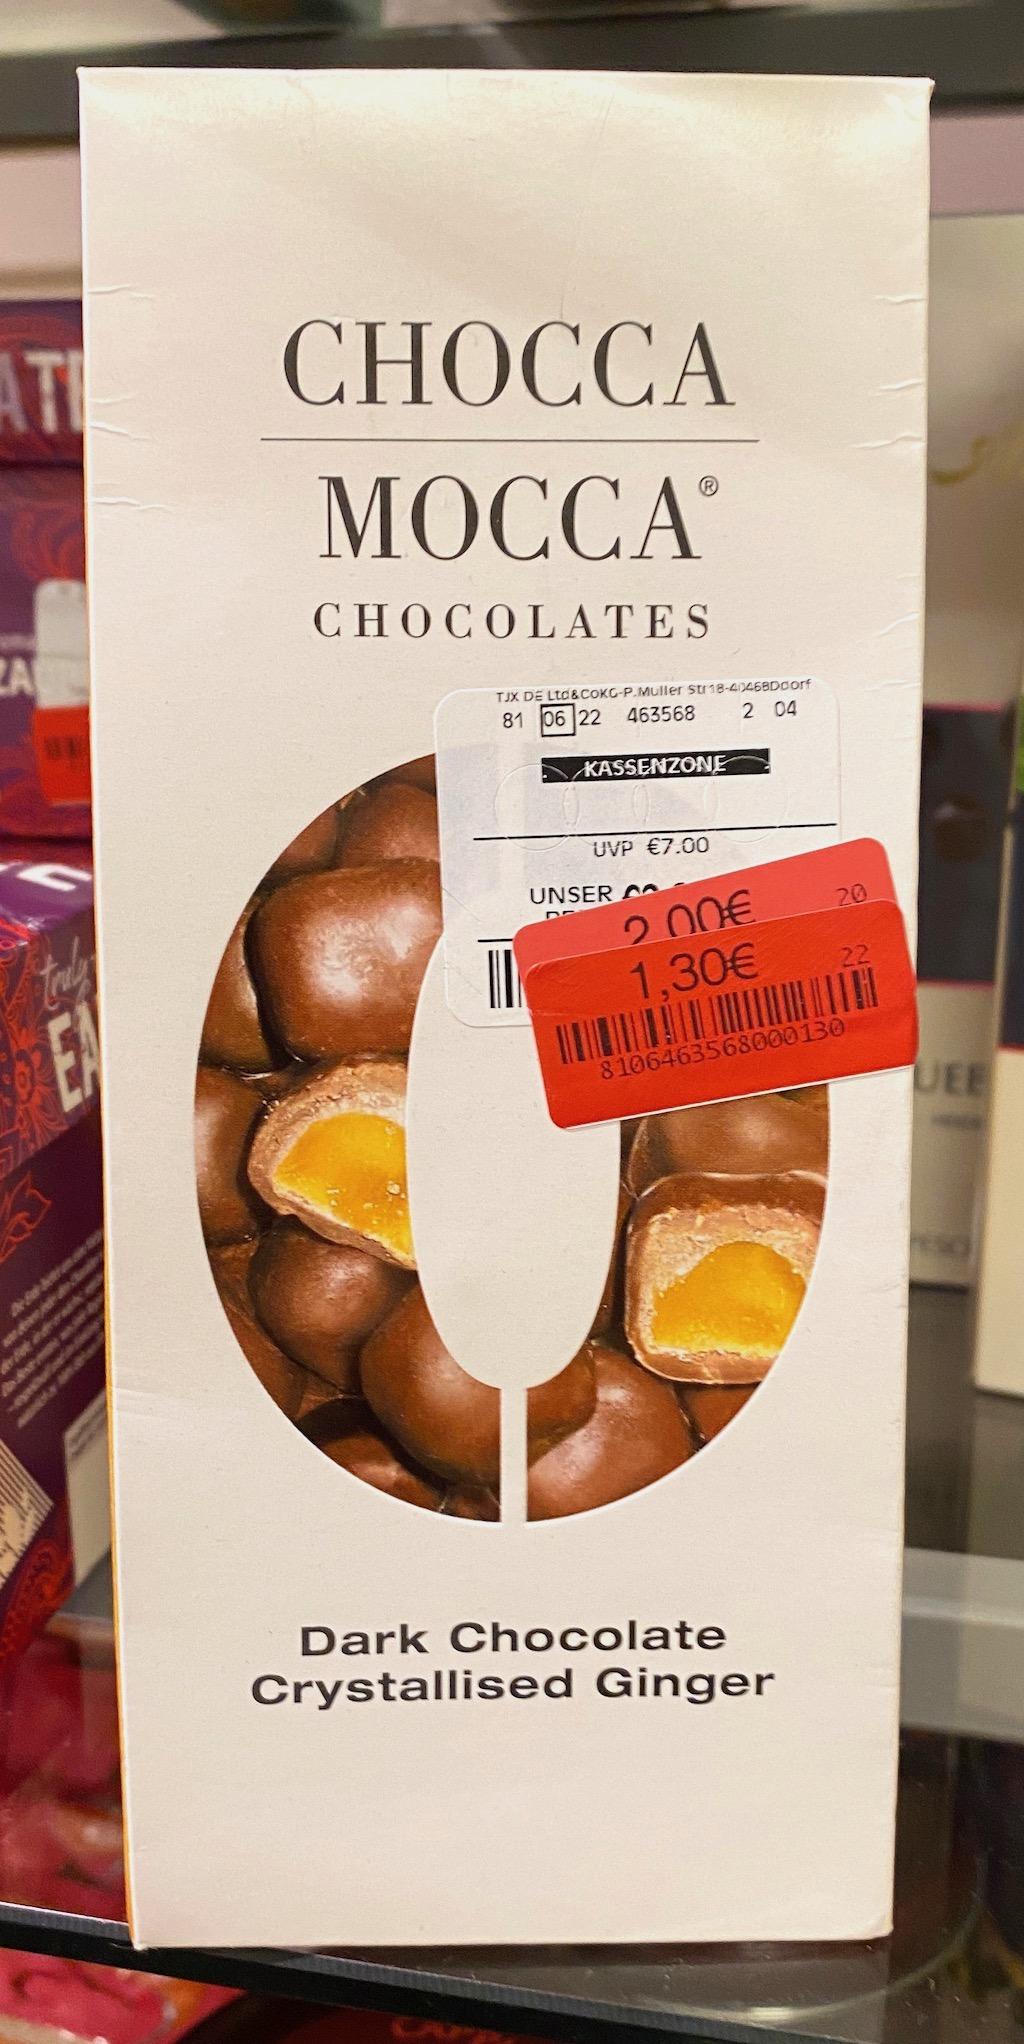 Chocca Mocca Chocolates Dark Chocolate Crystallised Ginger